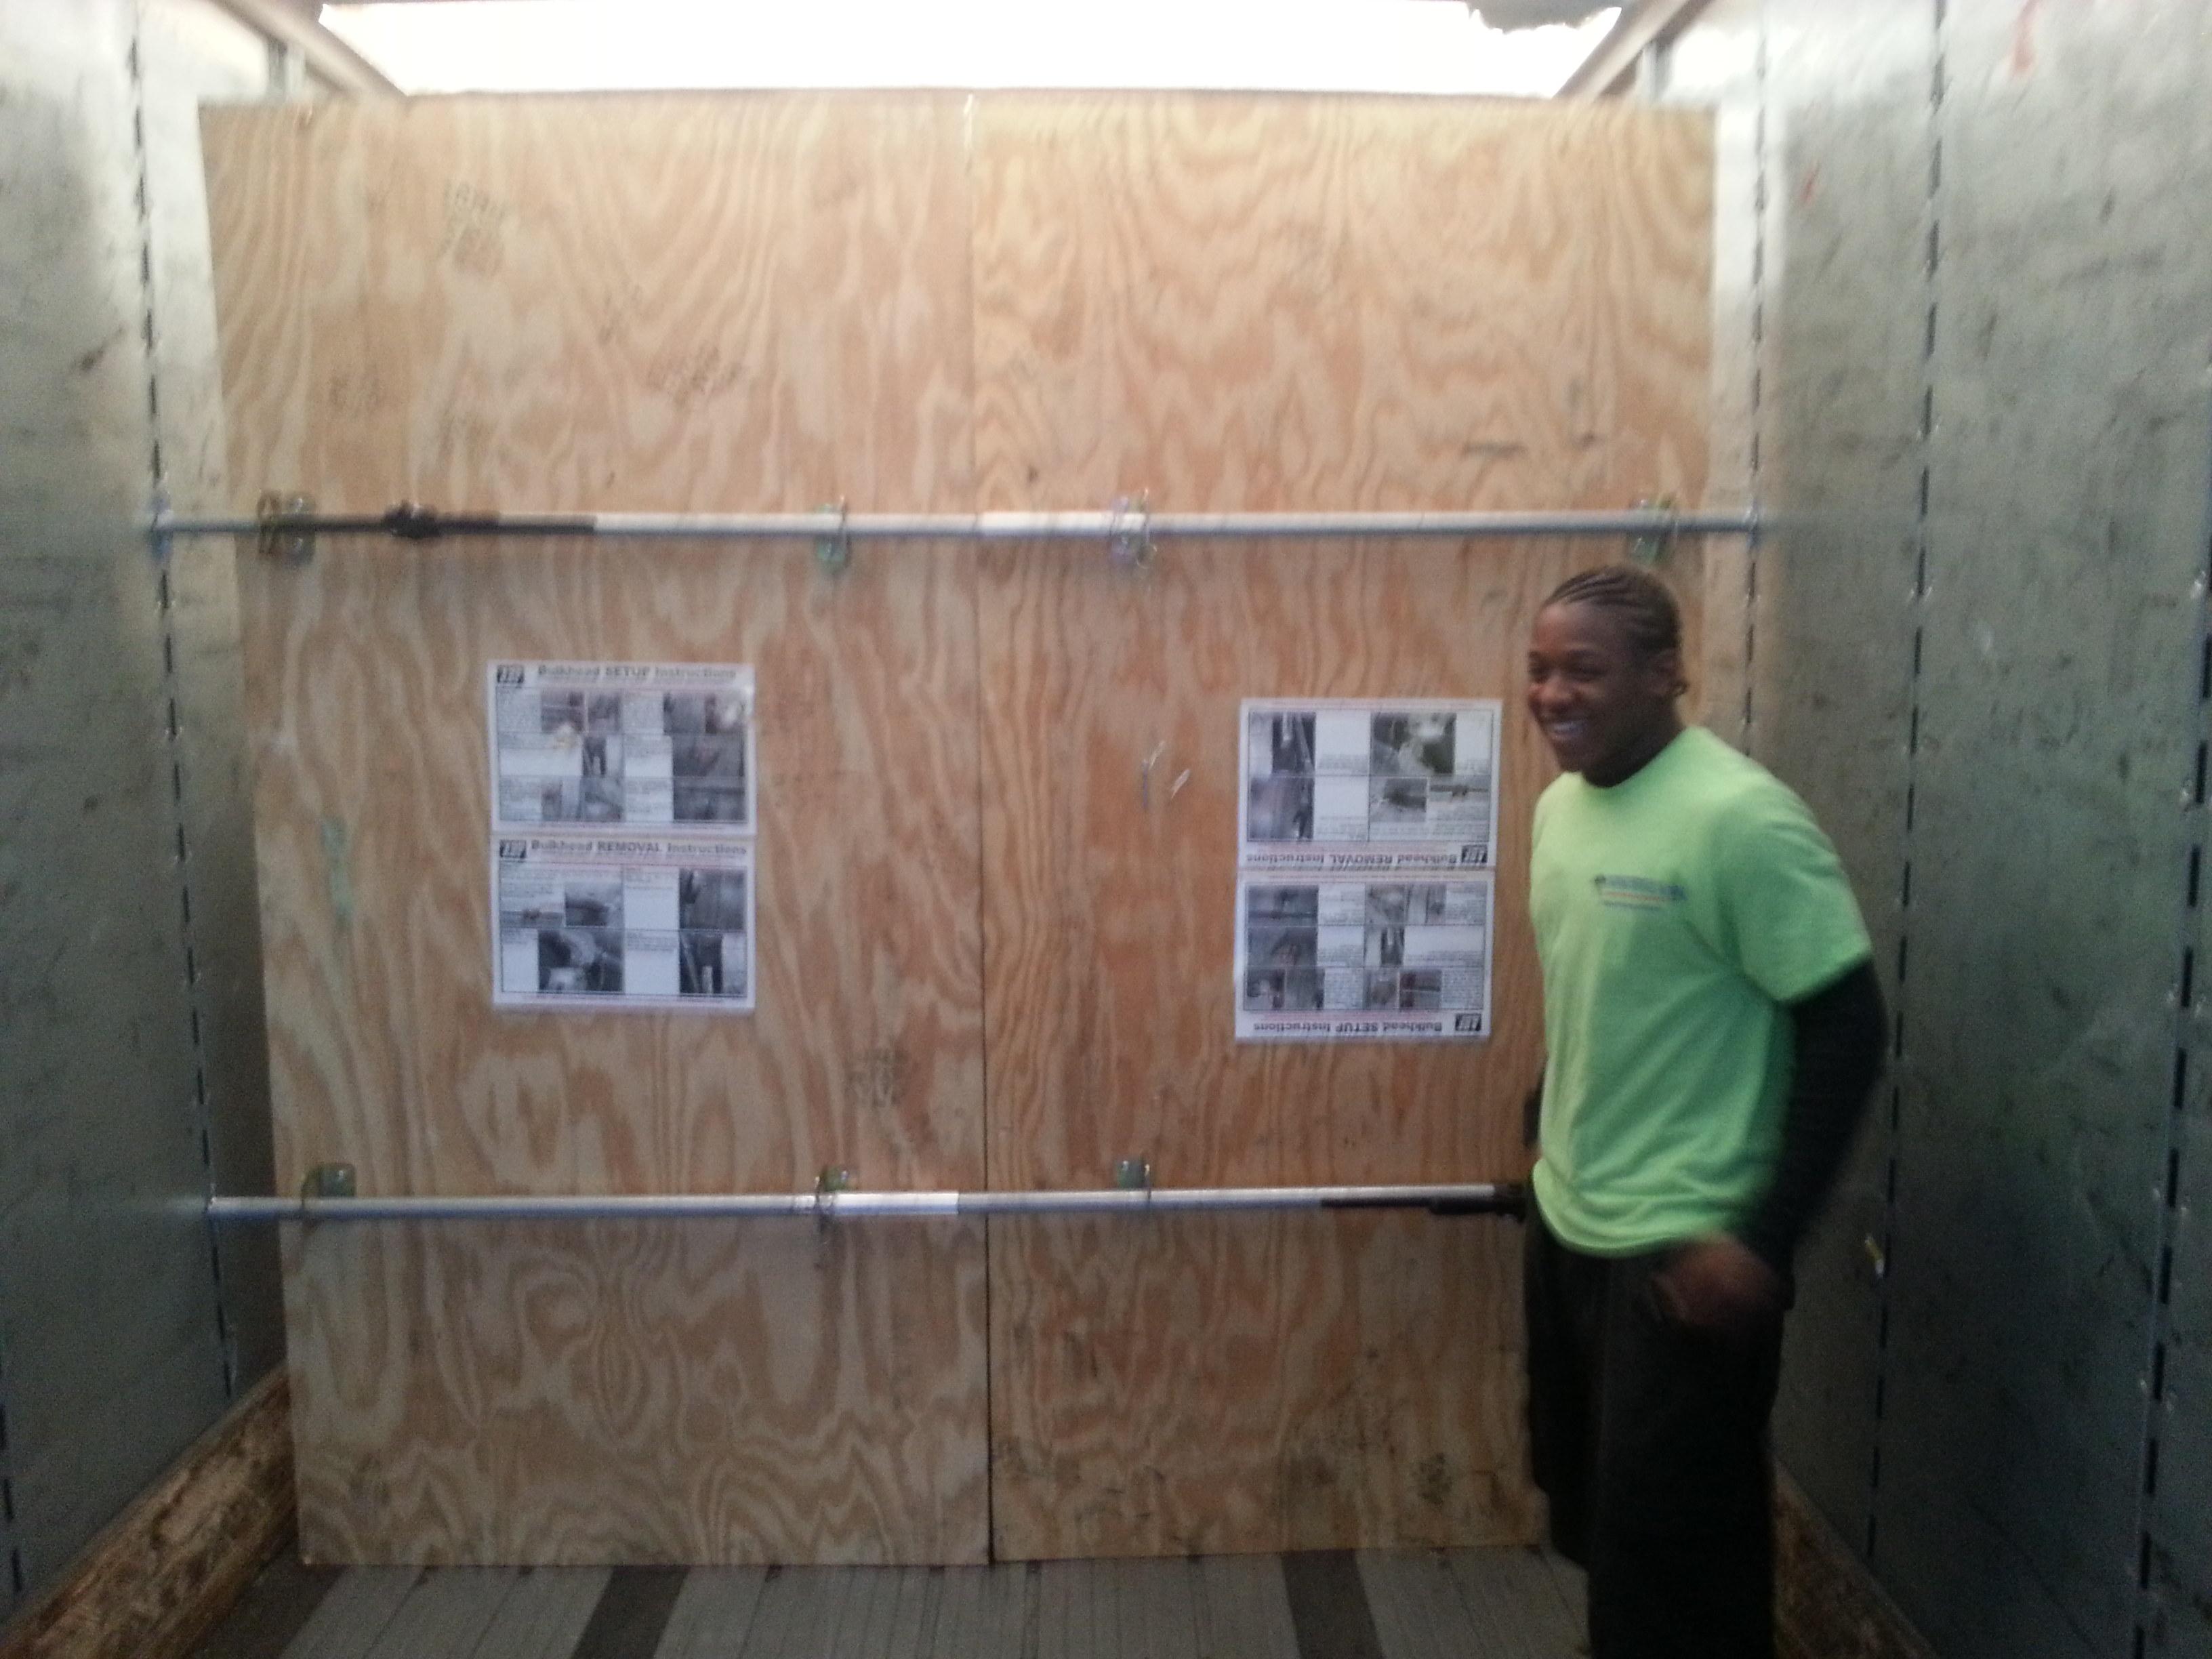 Professional Loading 40 foot trailer